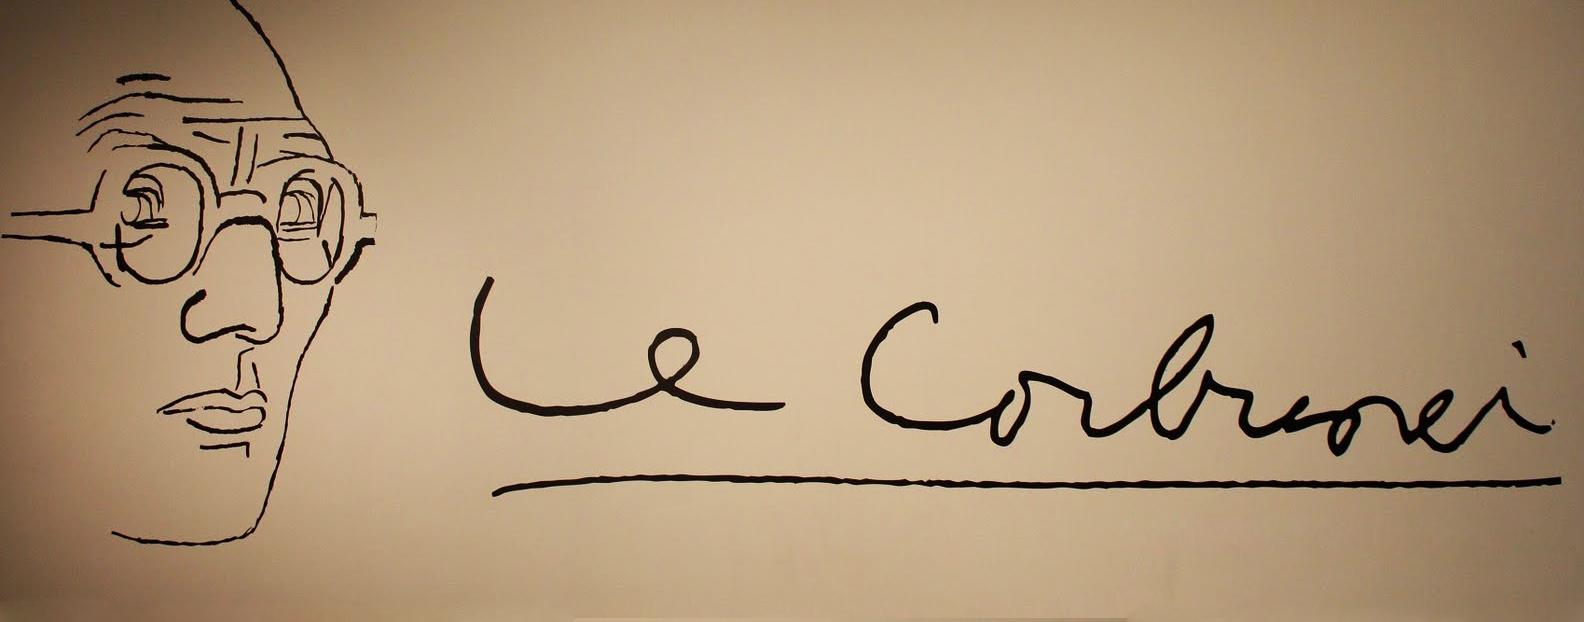 Assinatura de Le Corbusier